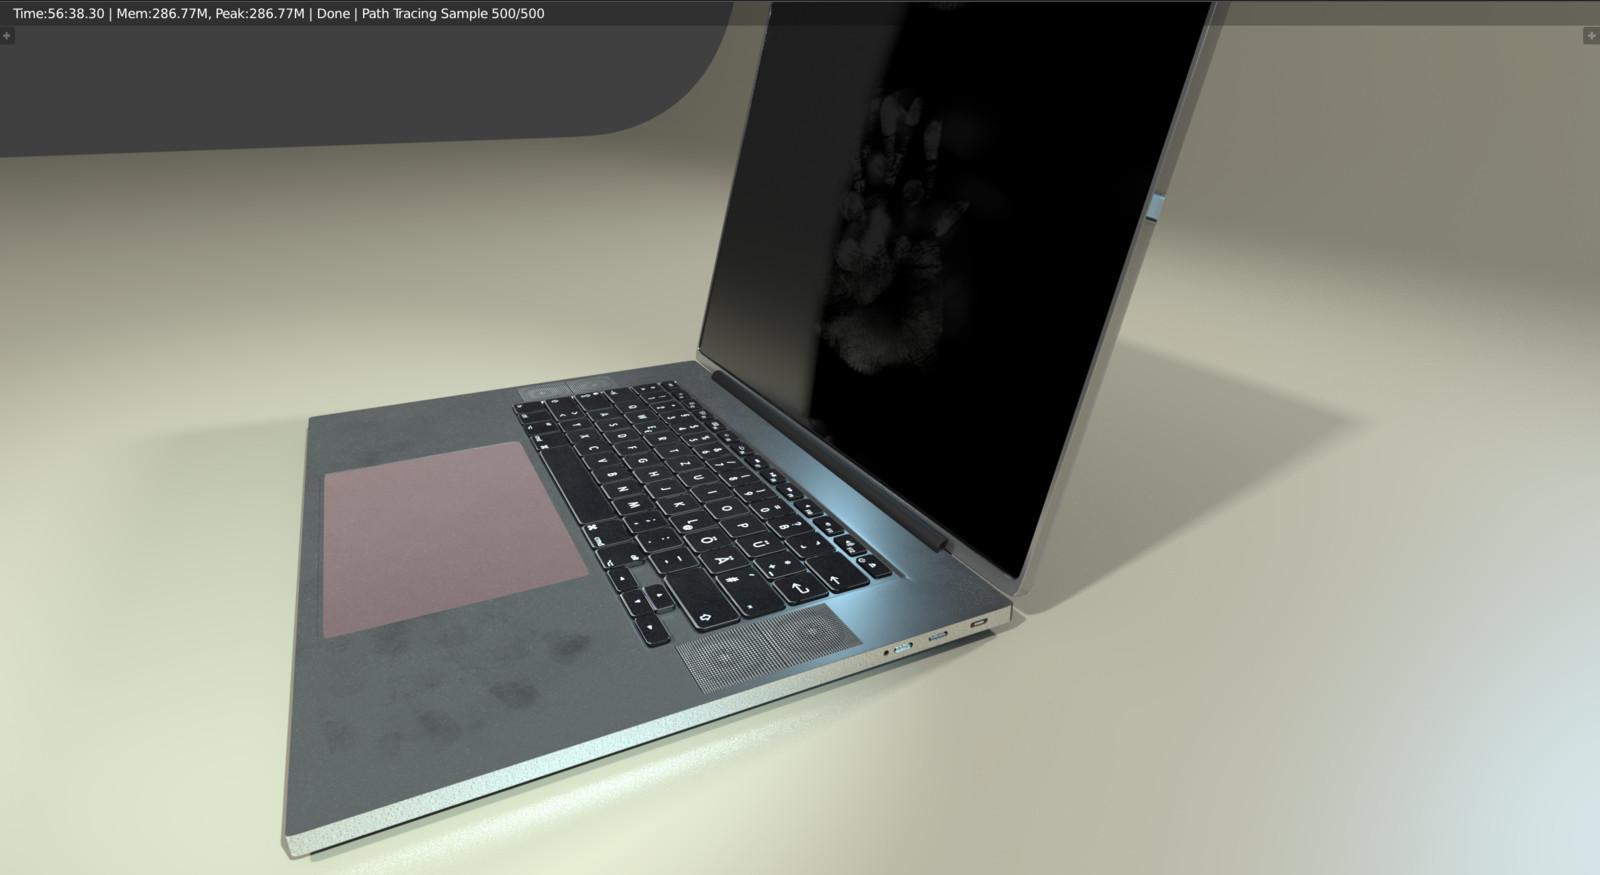 Original Laptop - Dirty w/ handprint